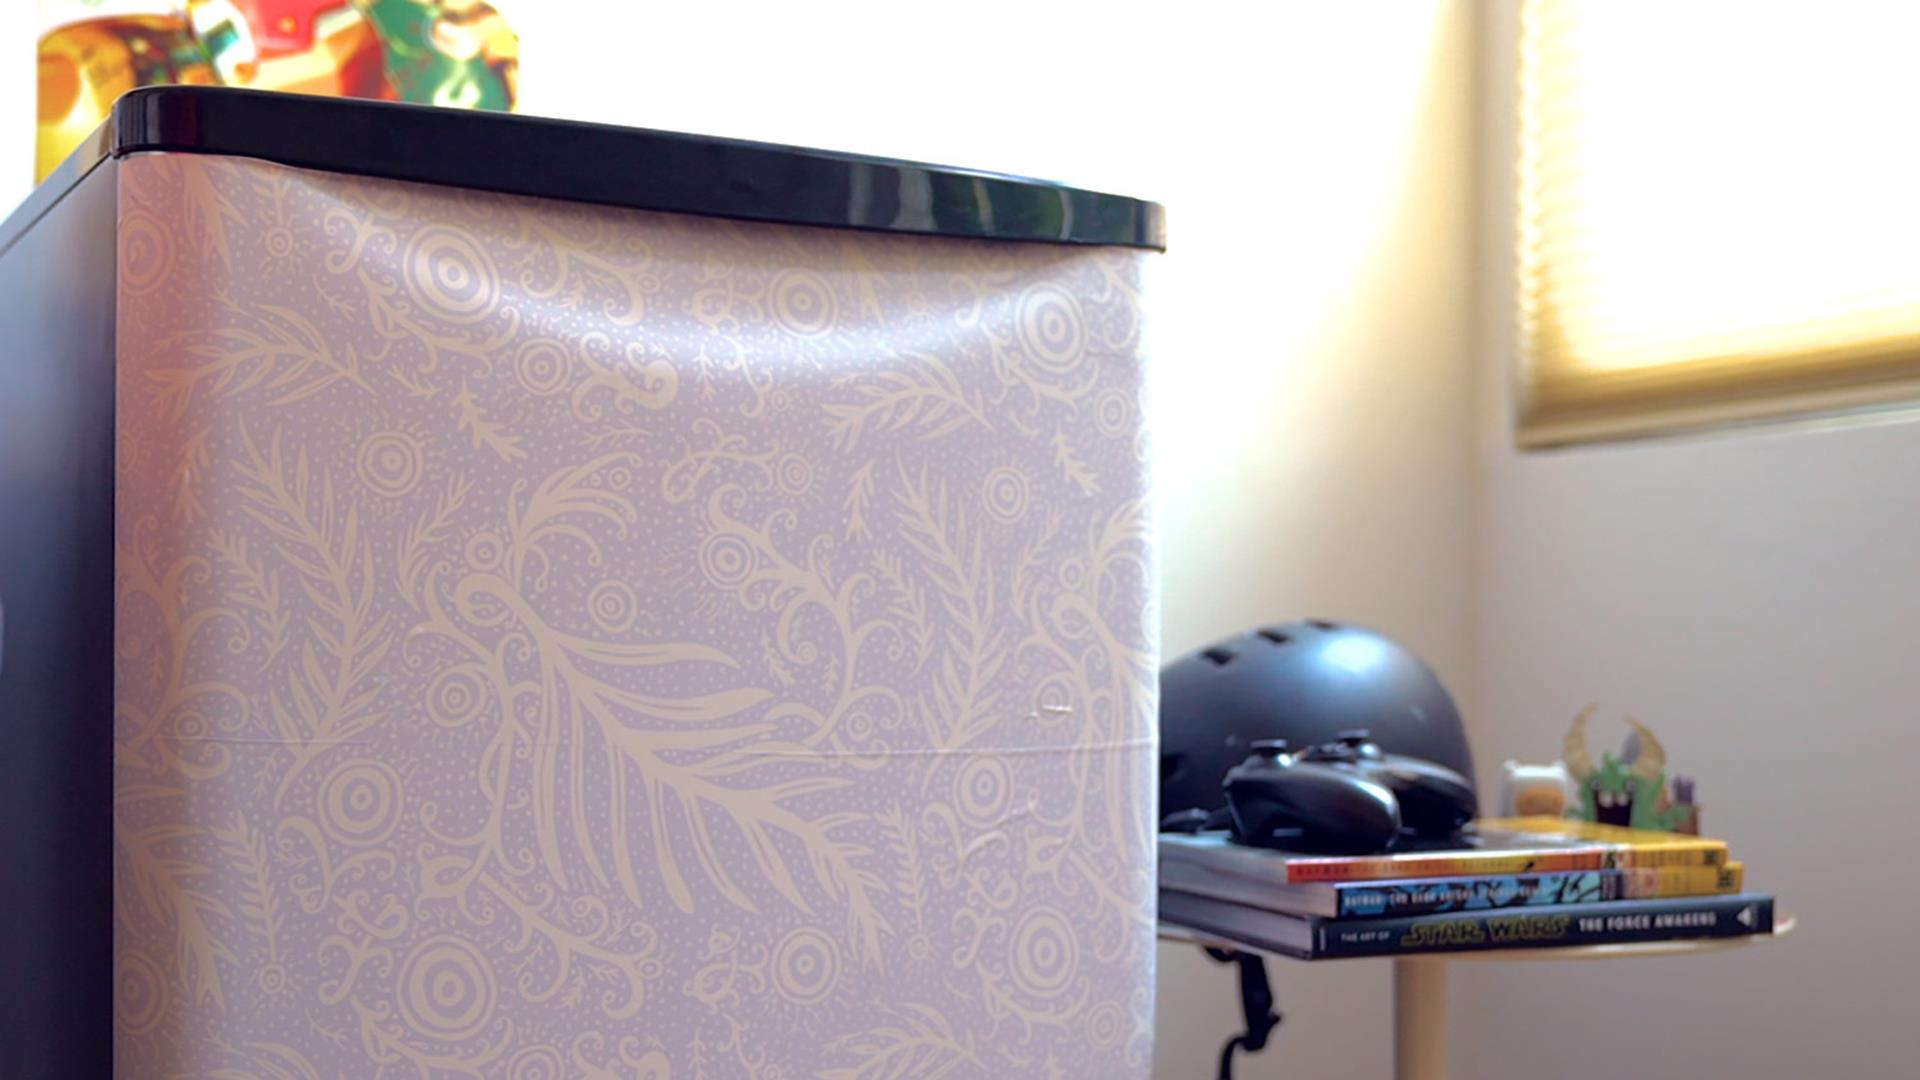 Compact Fridge For Dorm: Decorate Your Dorm Room Mini Fridge With Stick-on